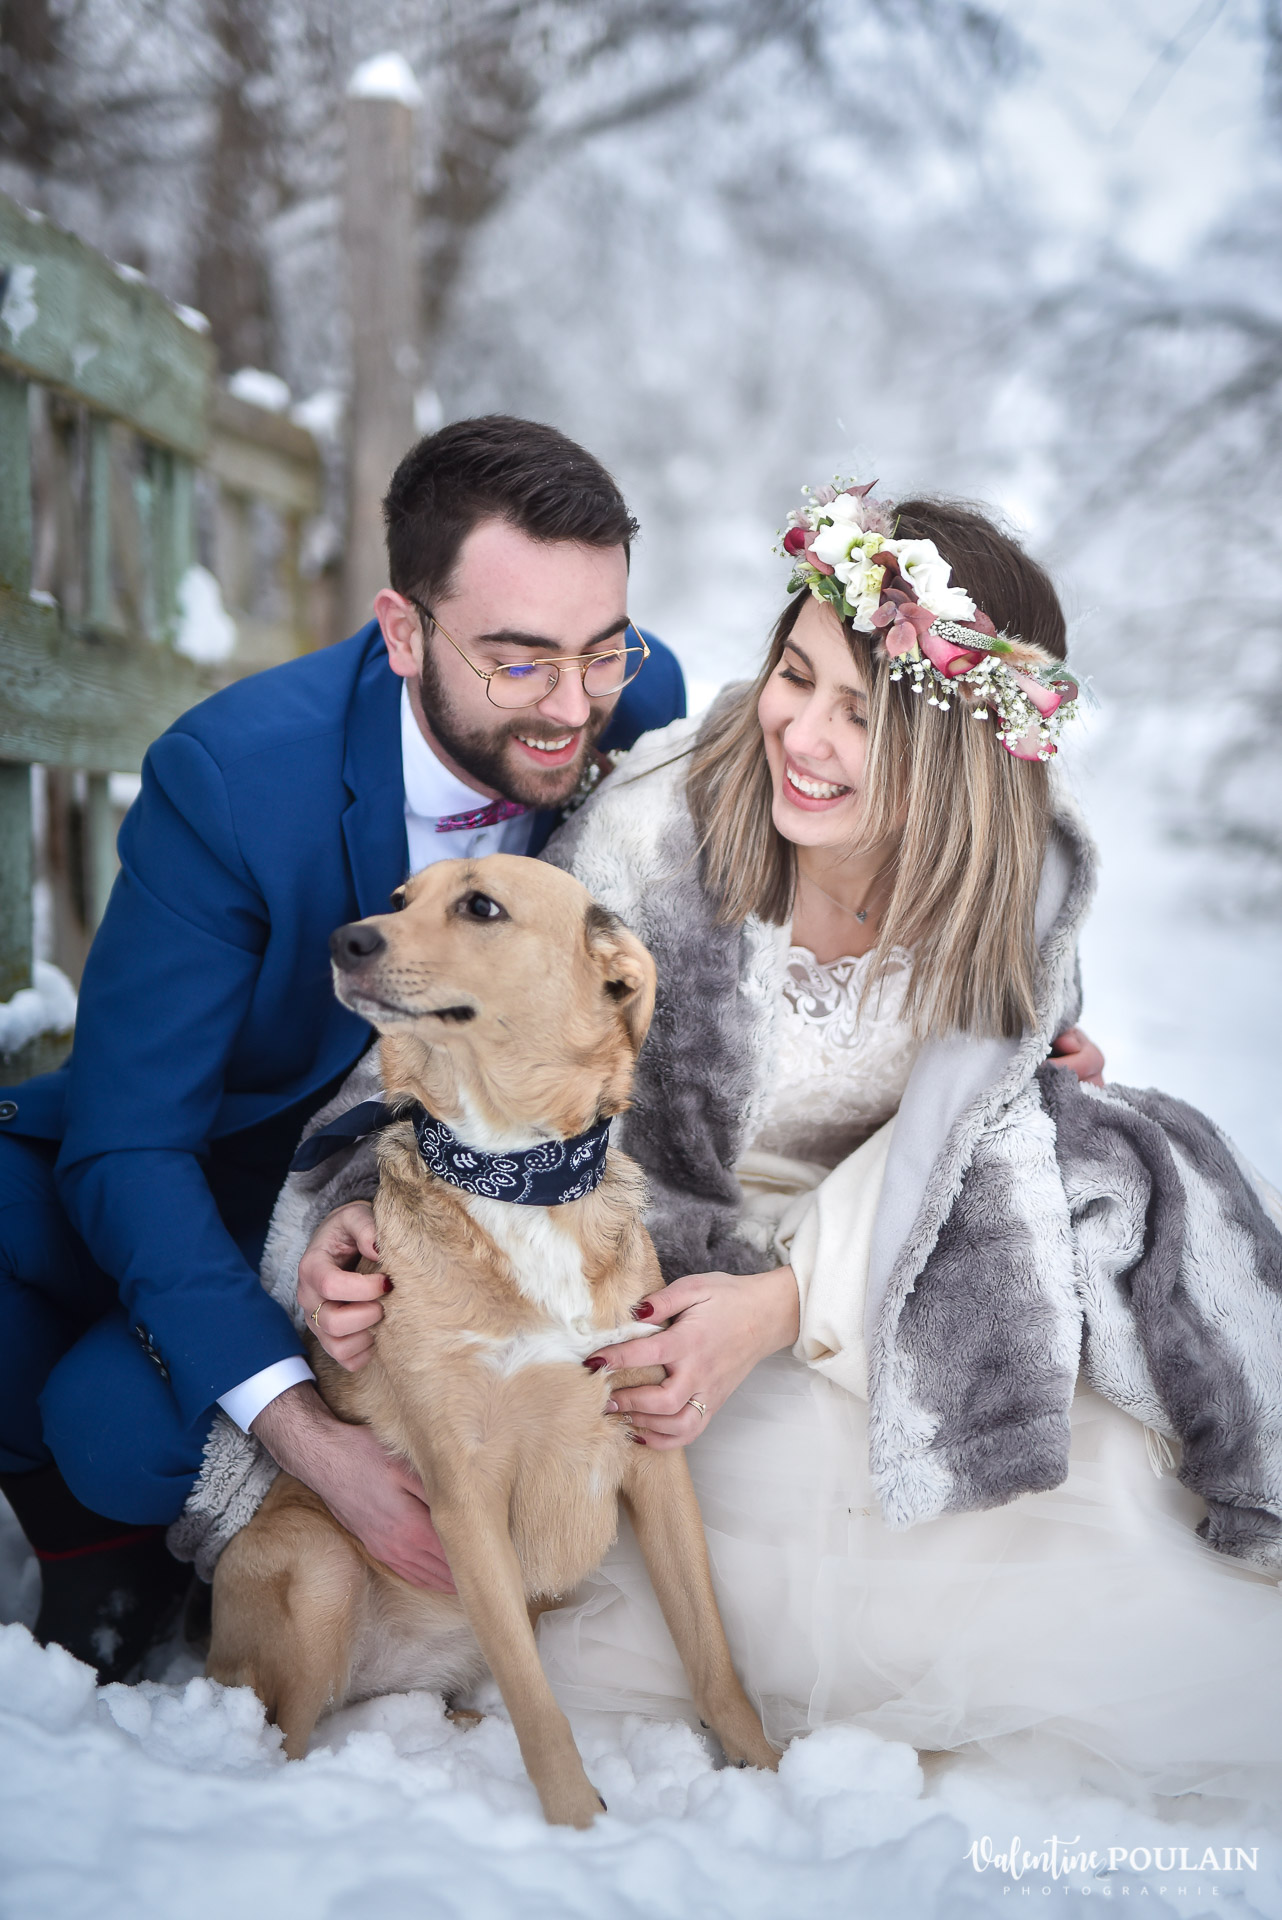 Photo mariage neige hiver - Valentine Poulain chien